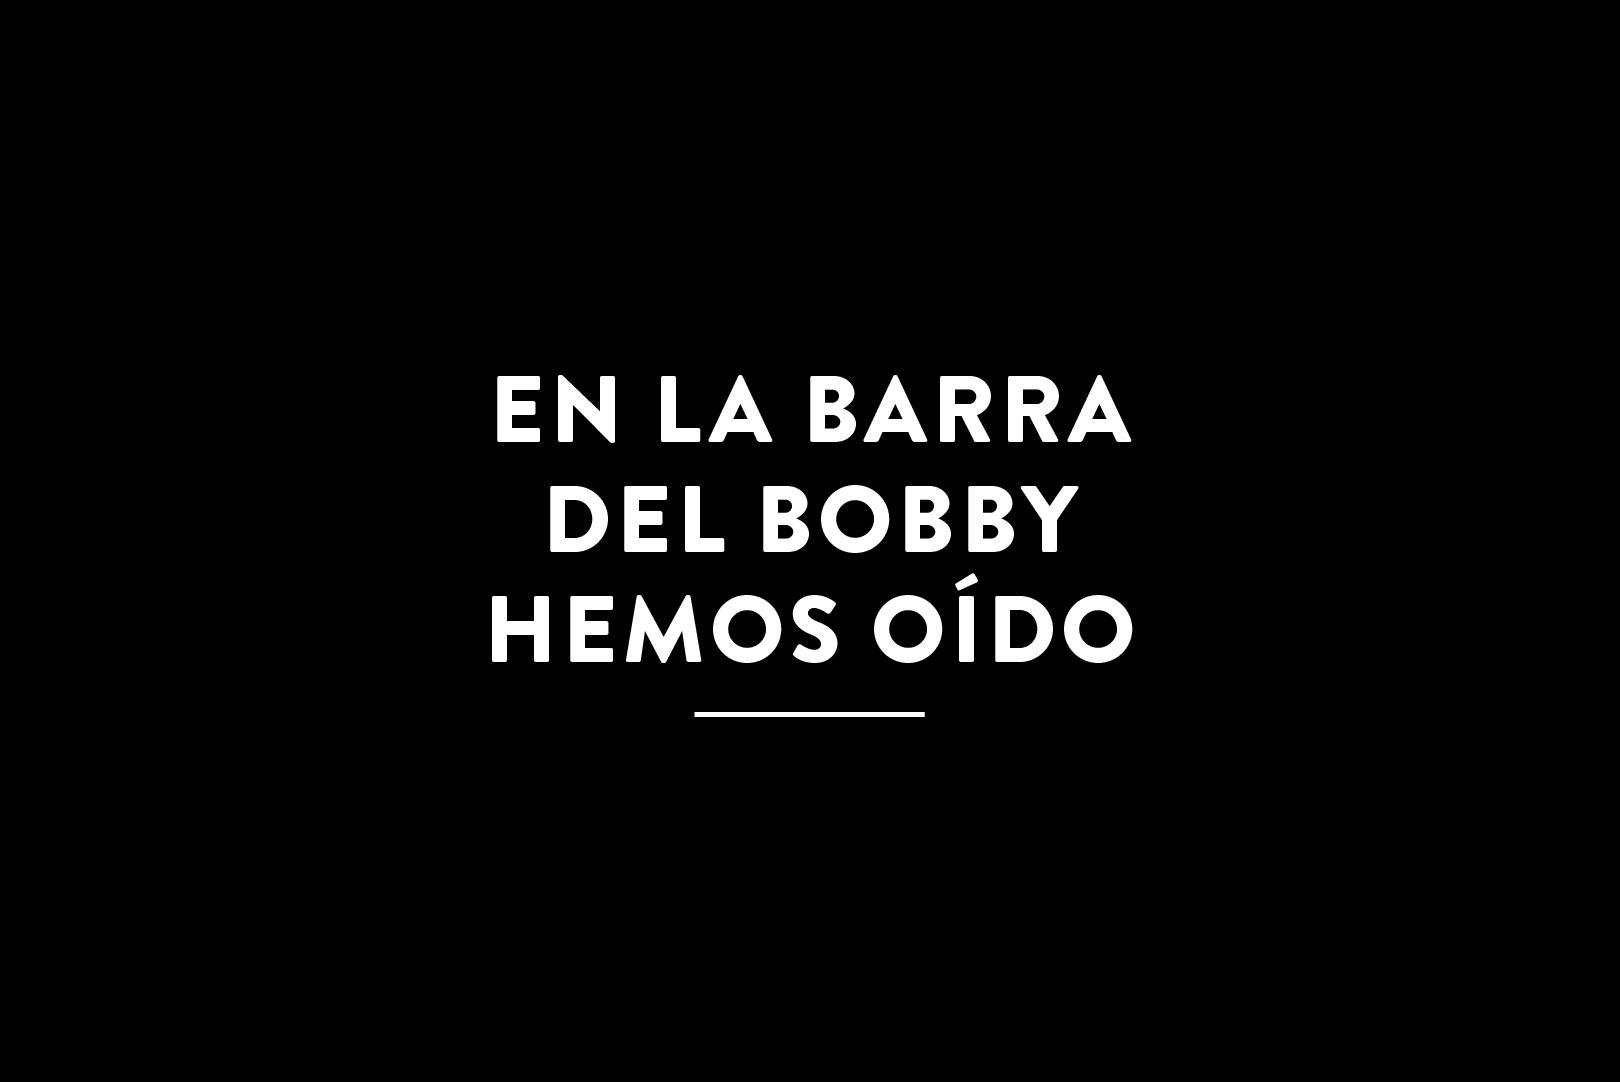 bobby-gin-linea-editorial-redes-sociales-bonita-bonitaidea-04-txt